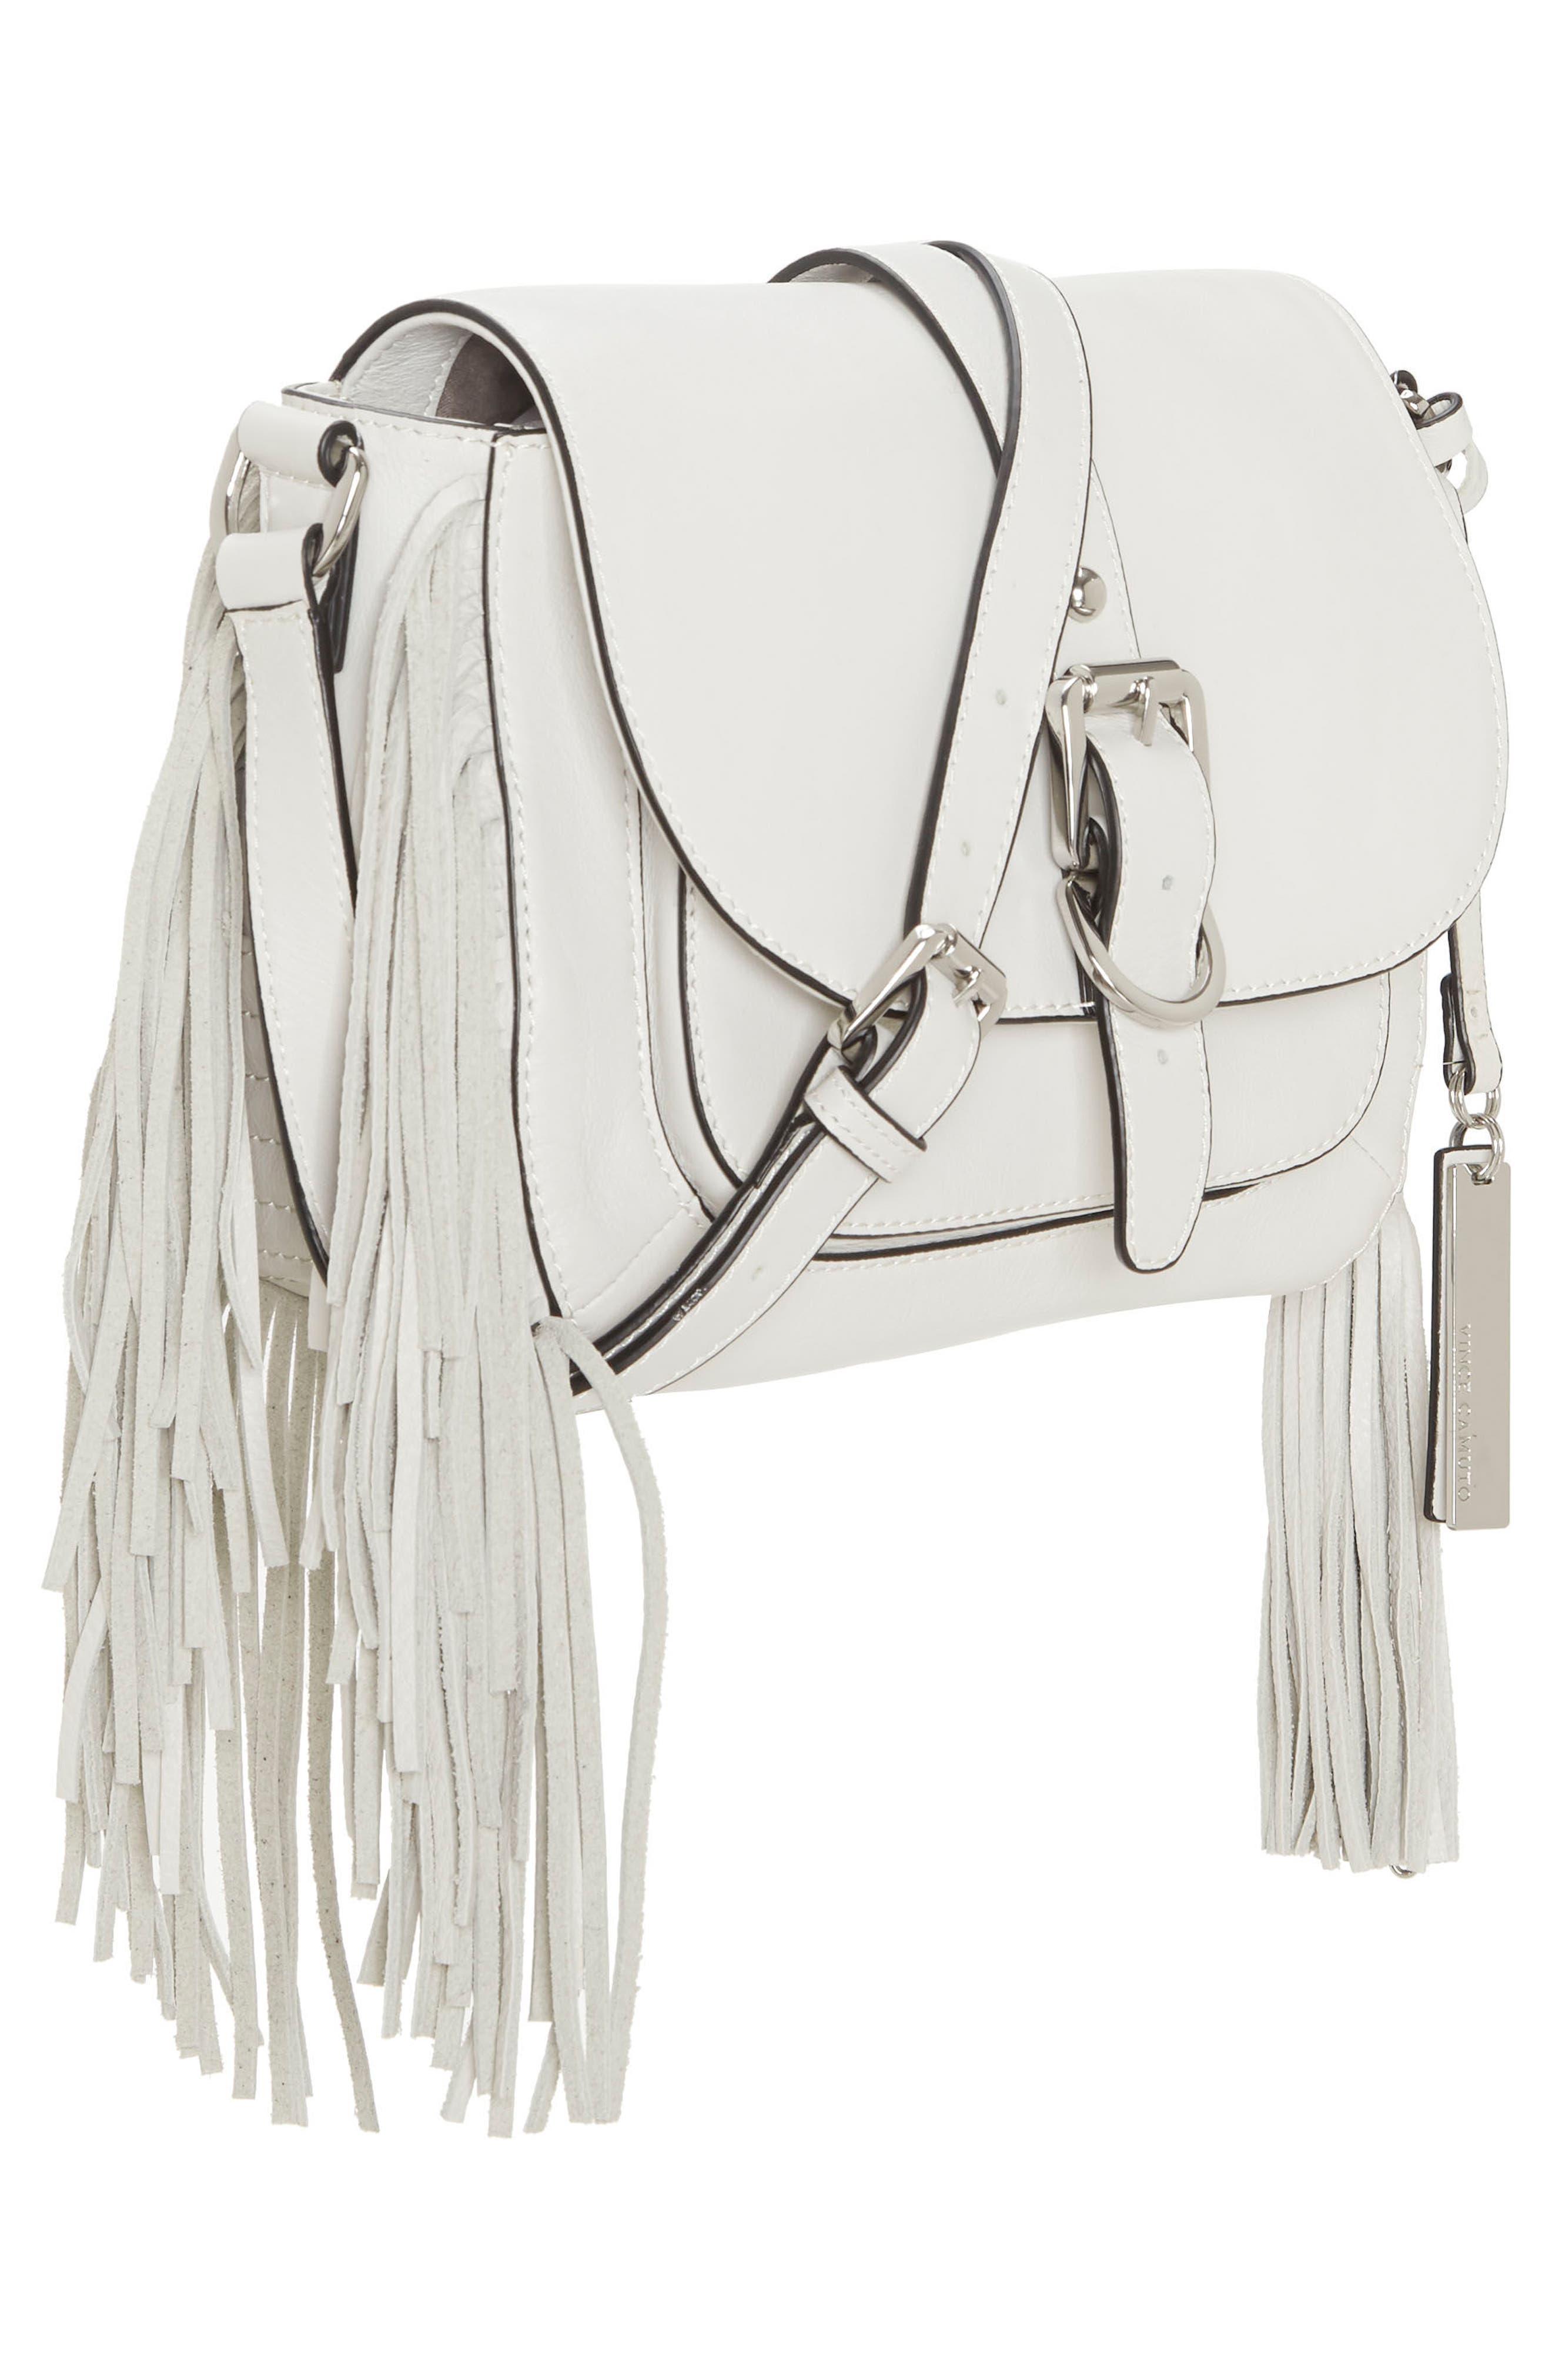 Hil Leather Crossbody Bag,                             Alternate thumbnail 4, color,                             Vaporous Grey